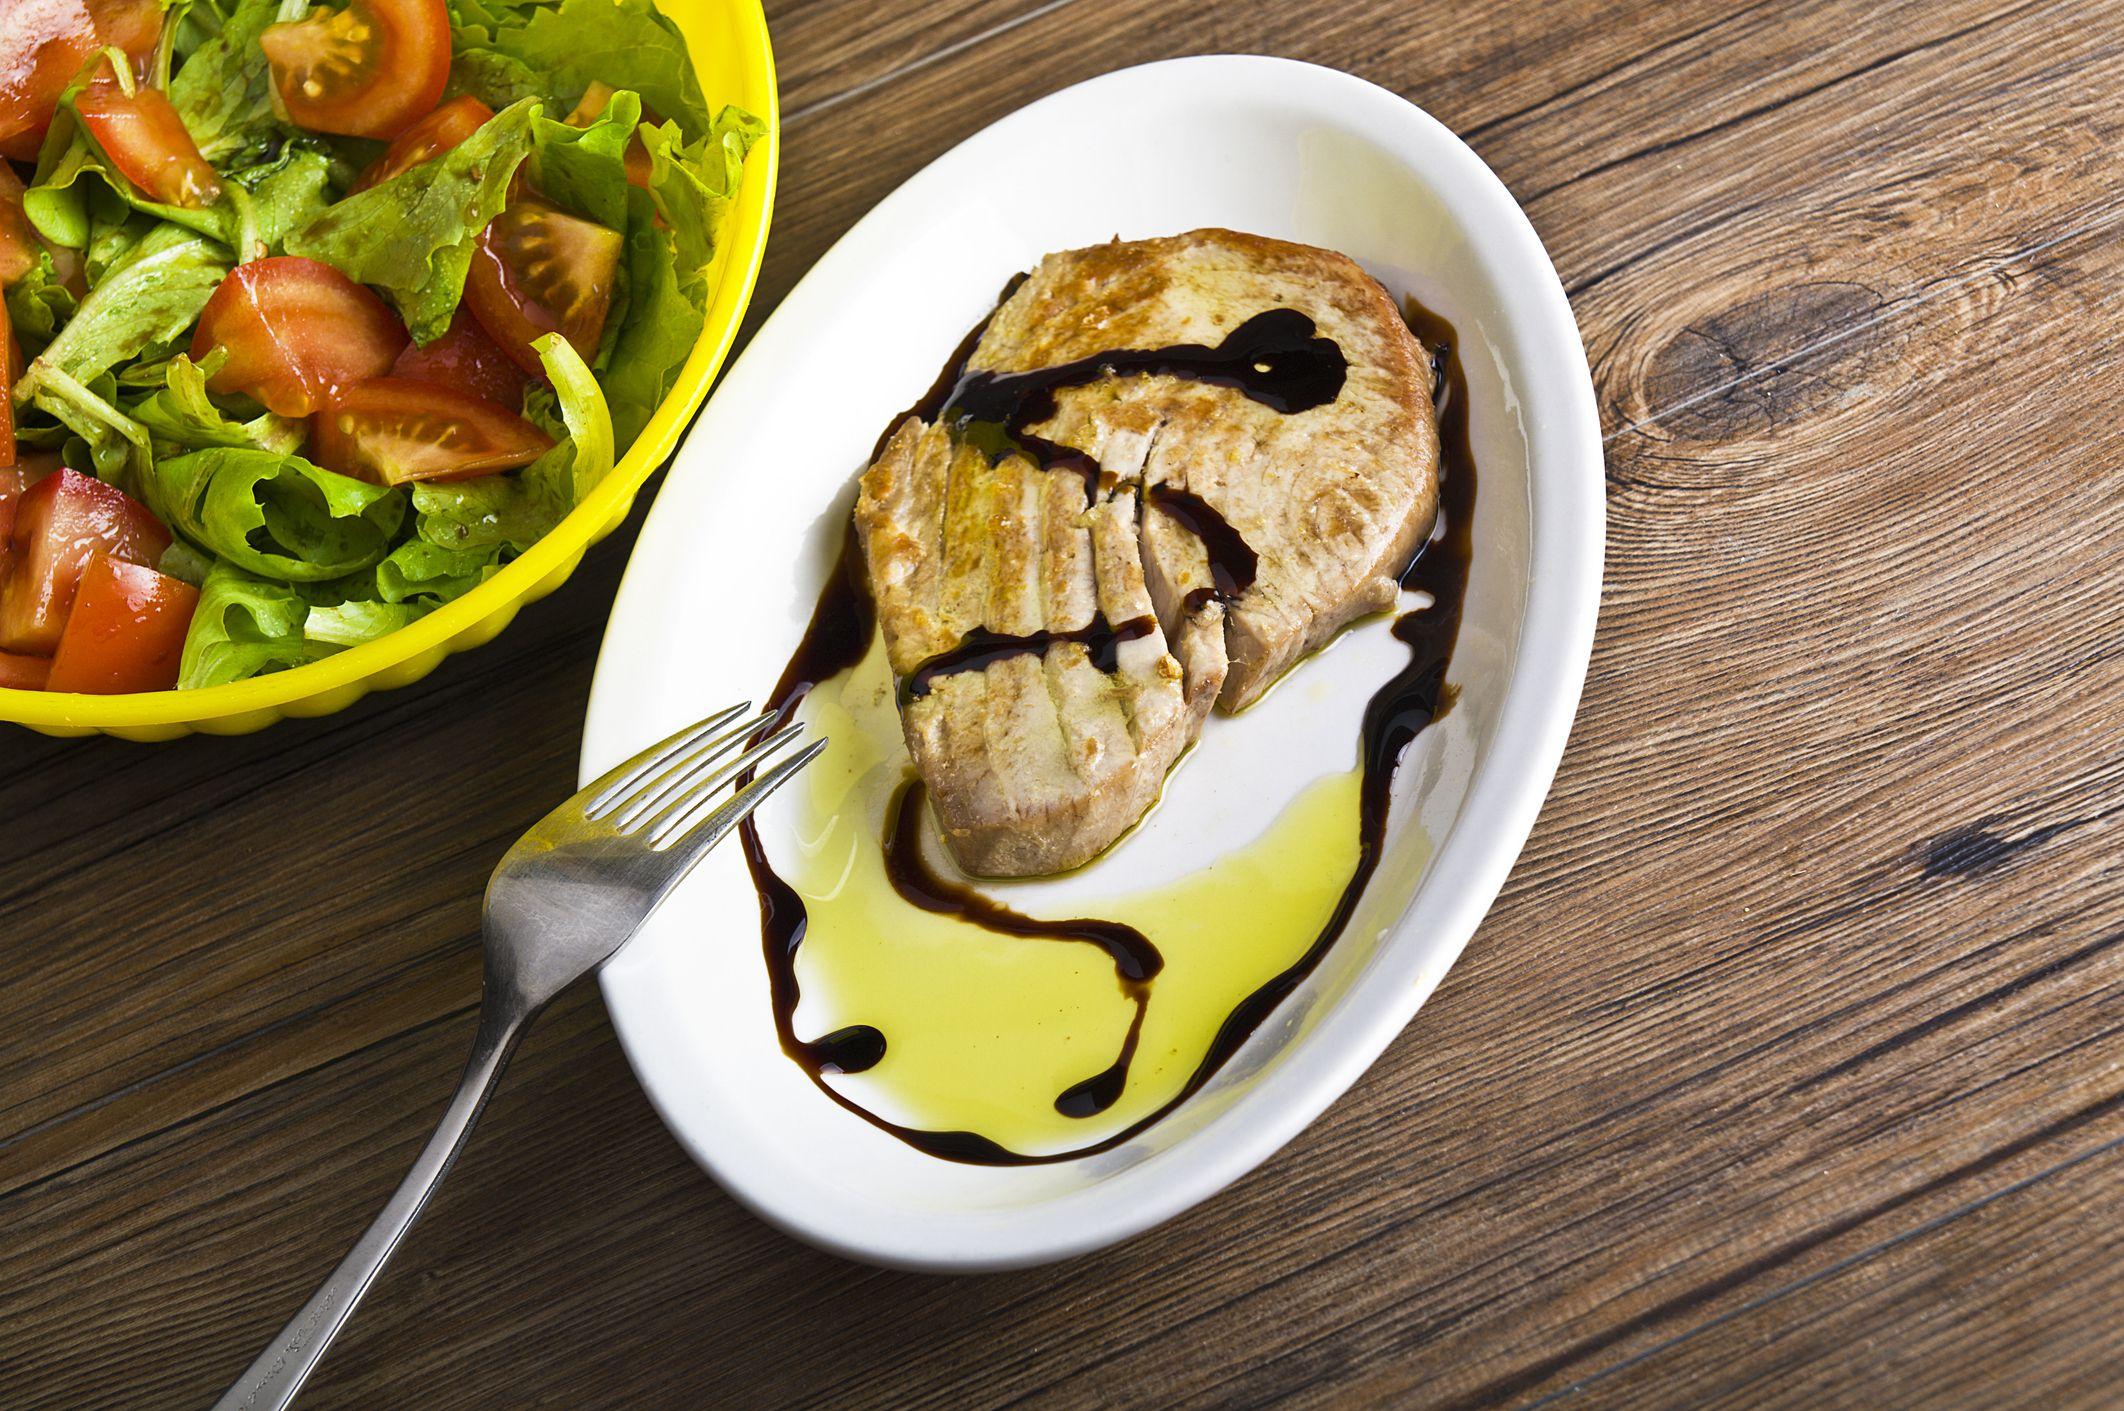 The Inaugural Post - Seared Tuna Steaks with Corn Salsa